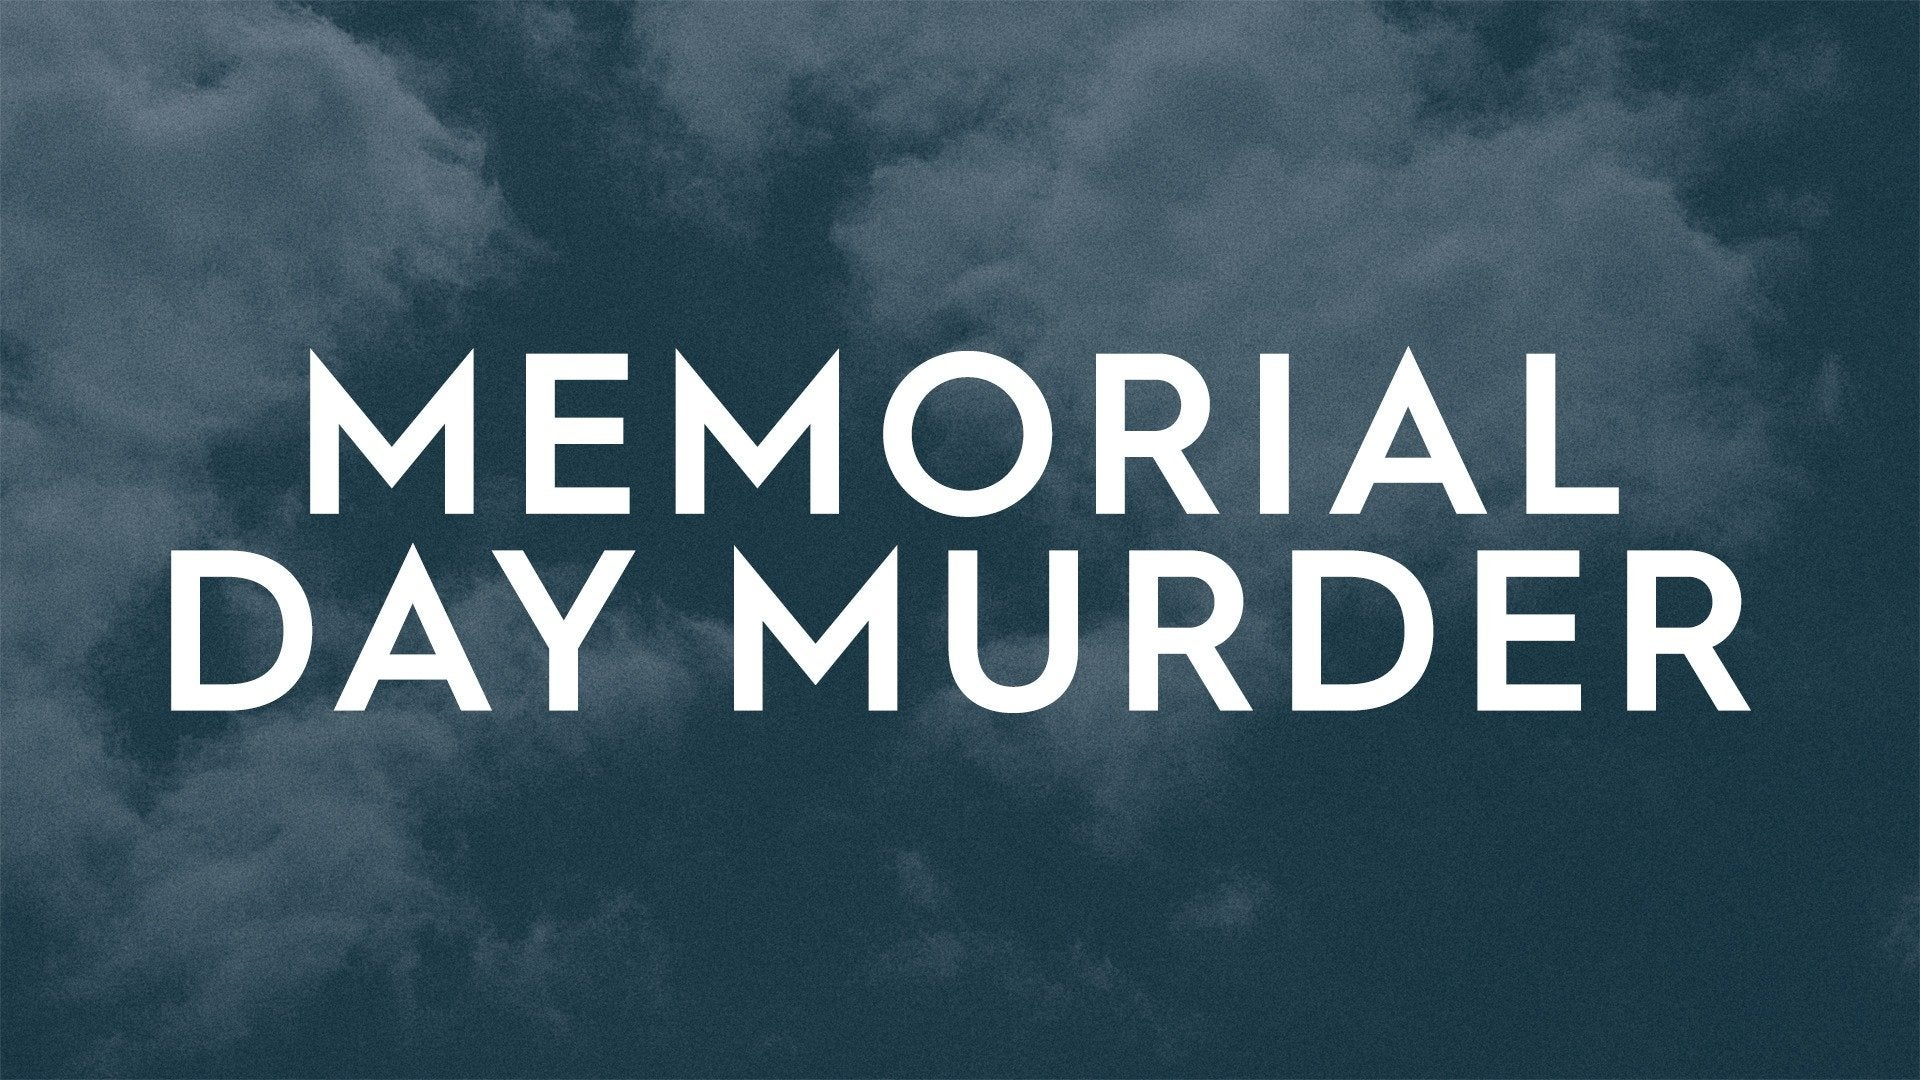 Memorial Day Murder